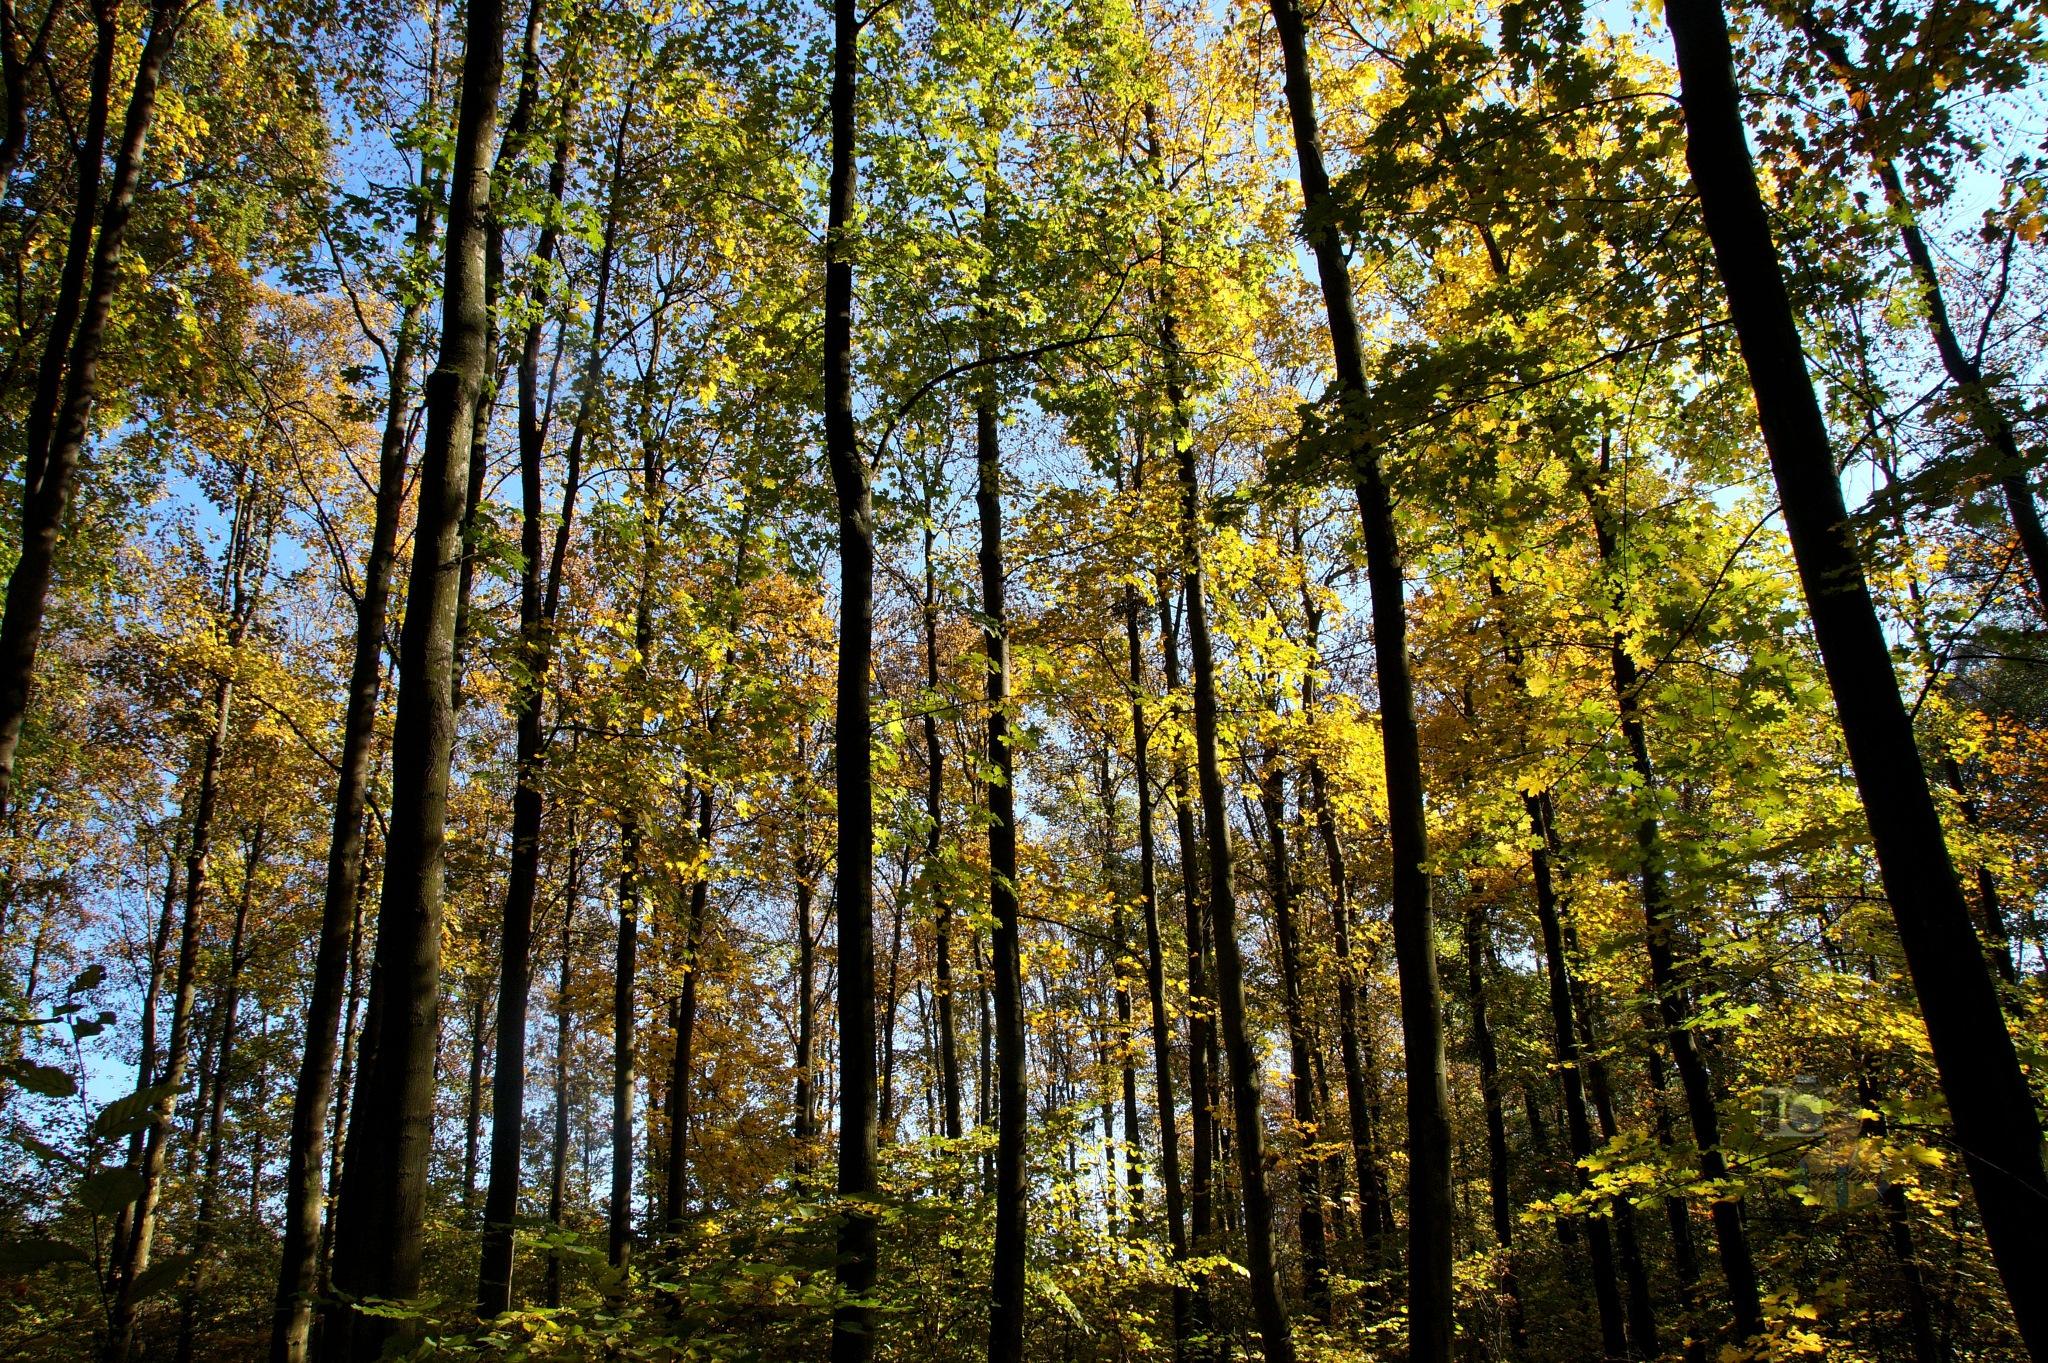 Oct.22, autumn forest #4 by hunyadigeza